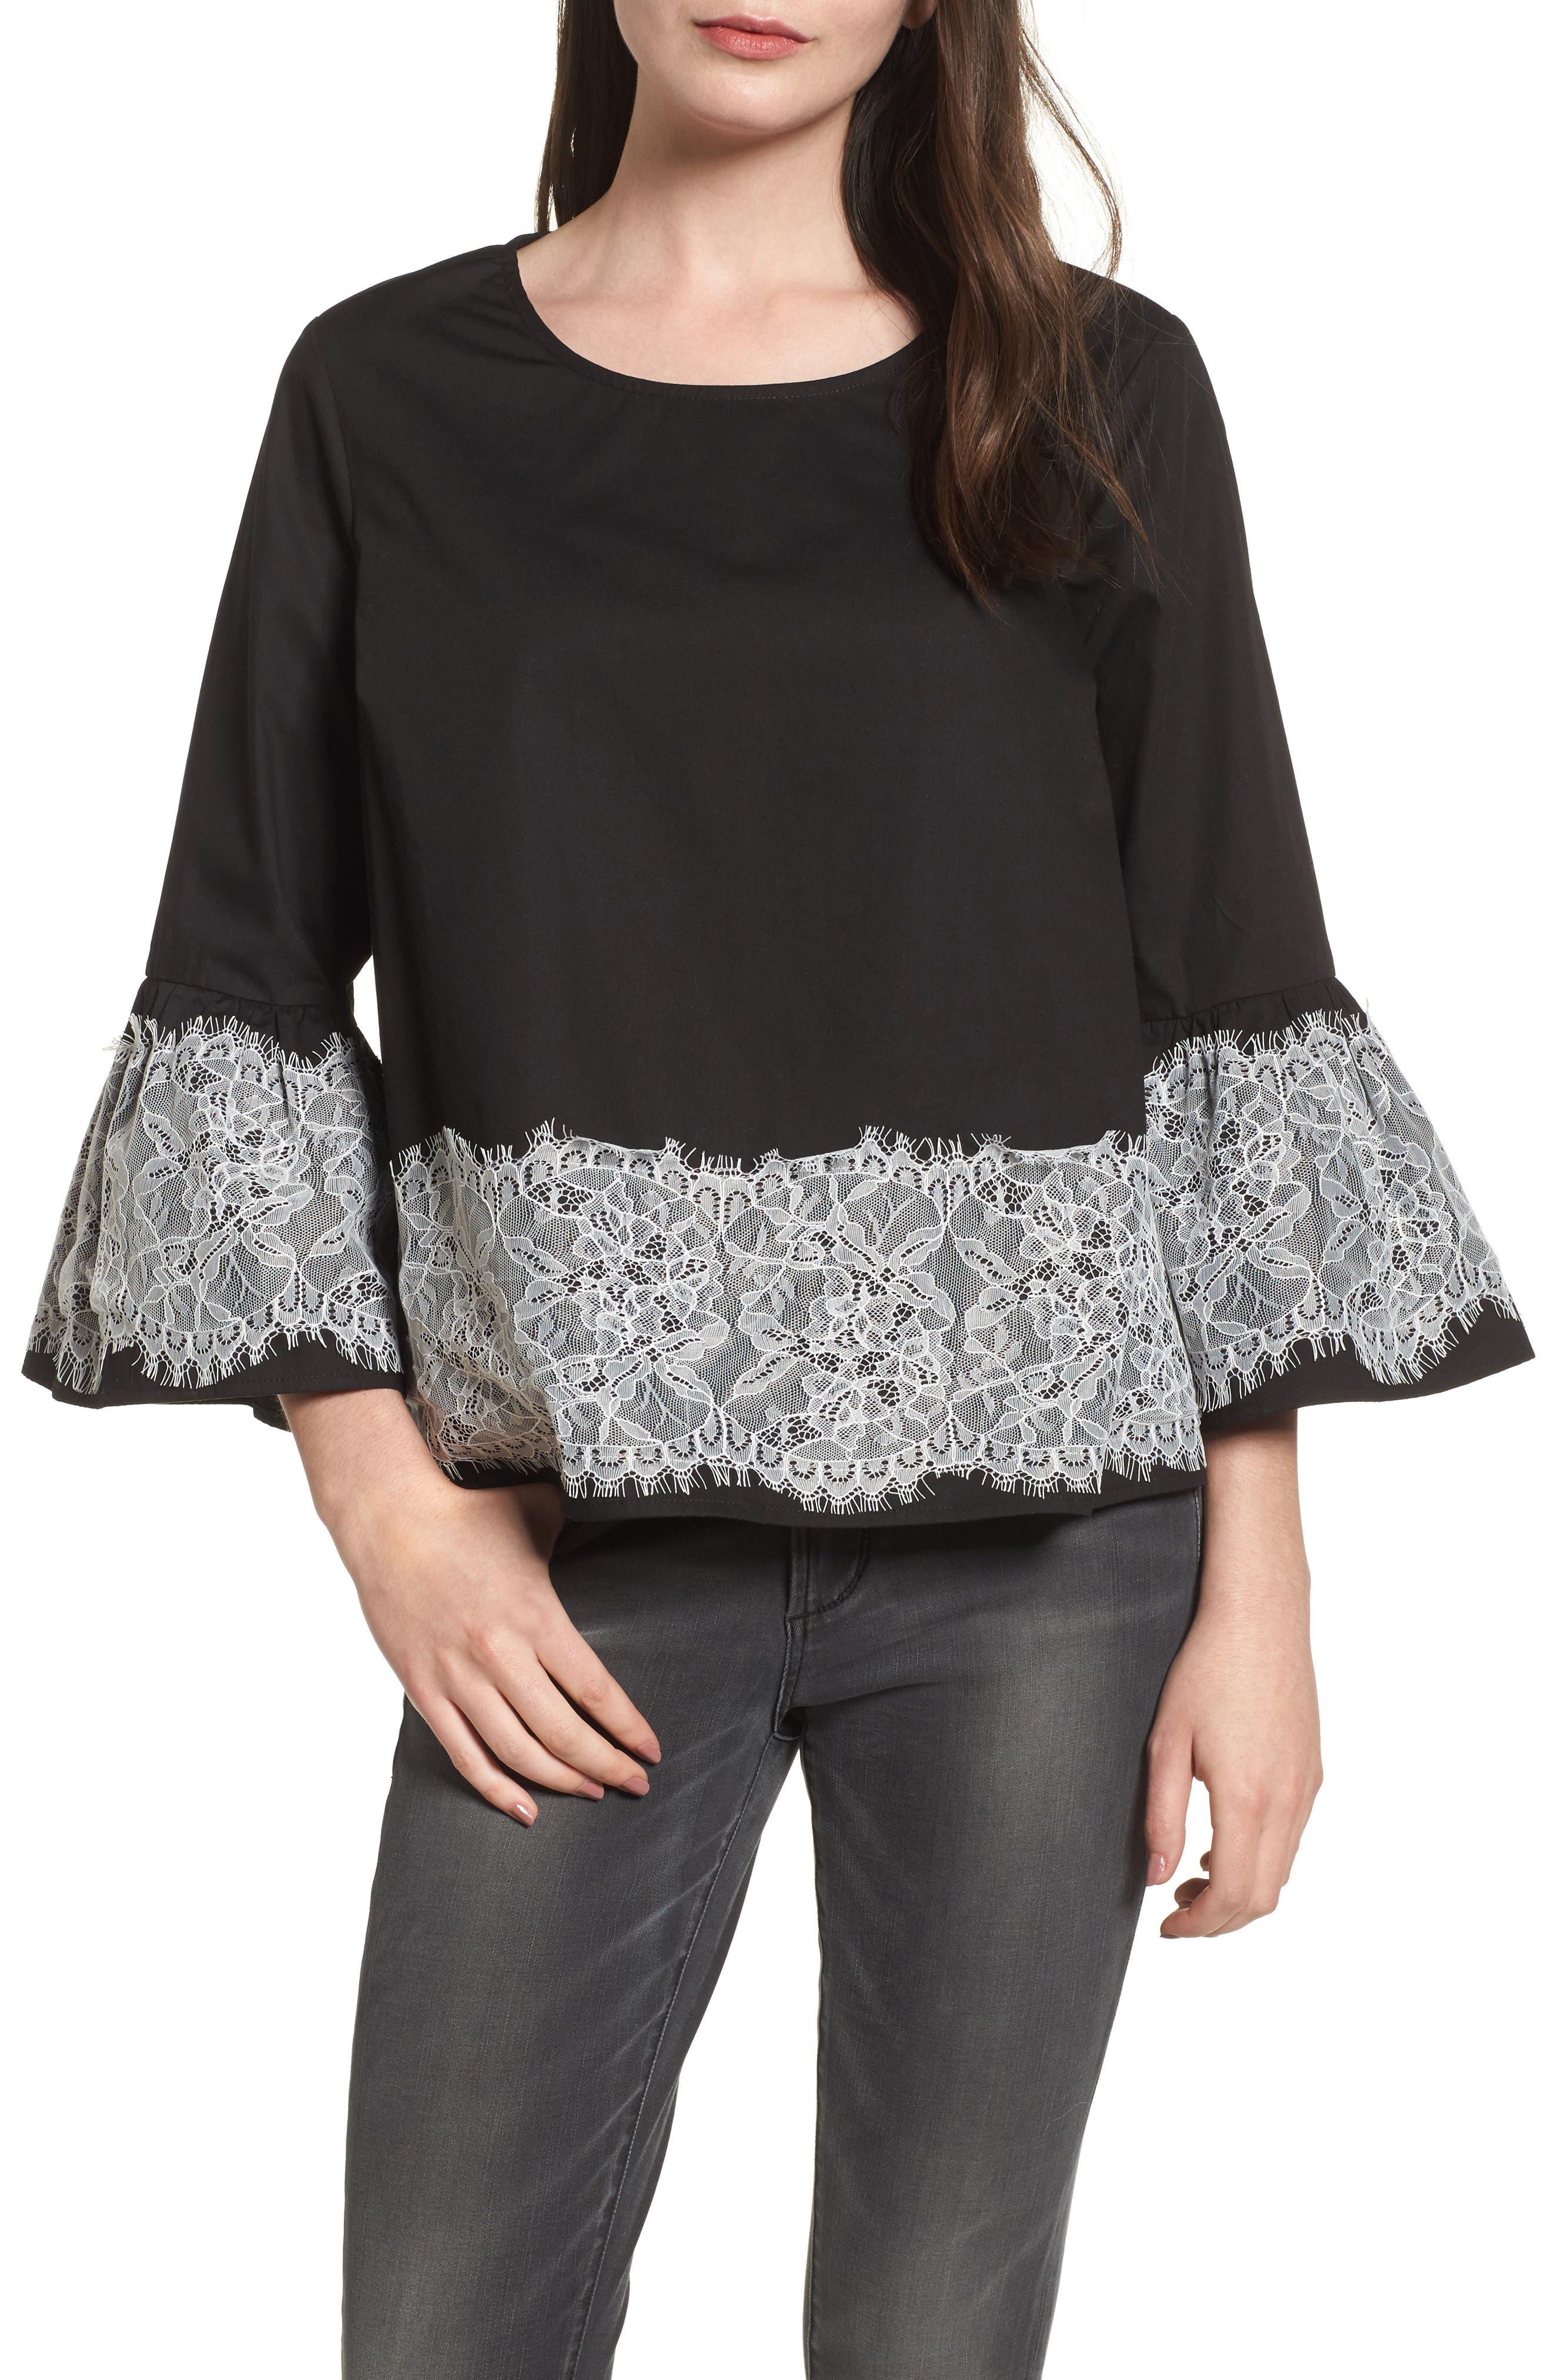 Alternate Image 1 Selected - Cotton Emporium Lace Trim Top